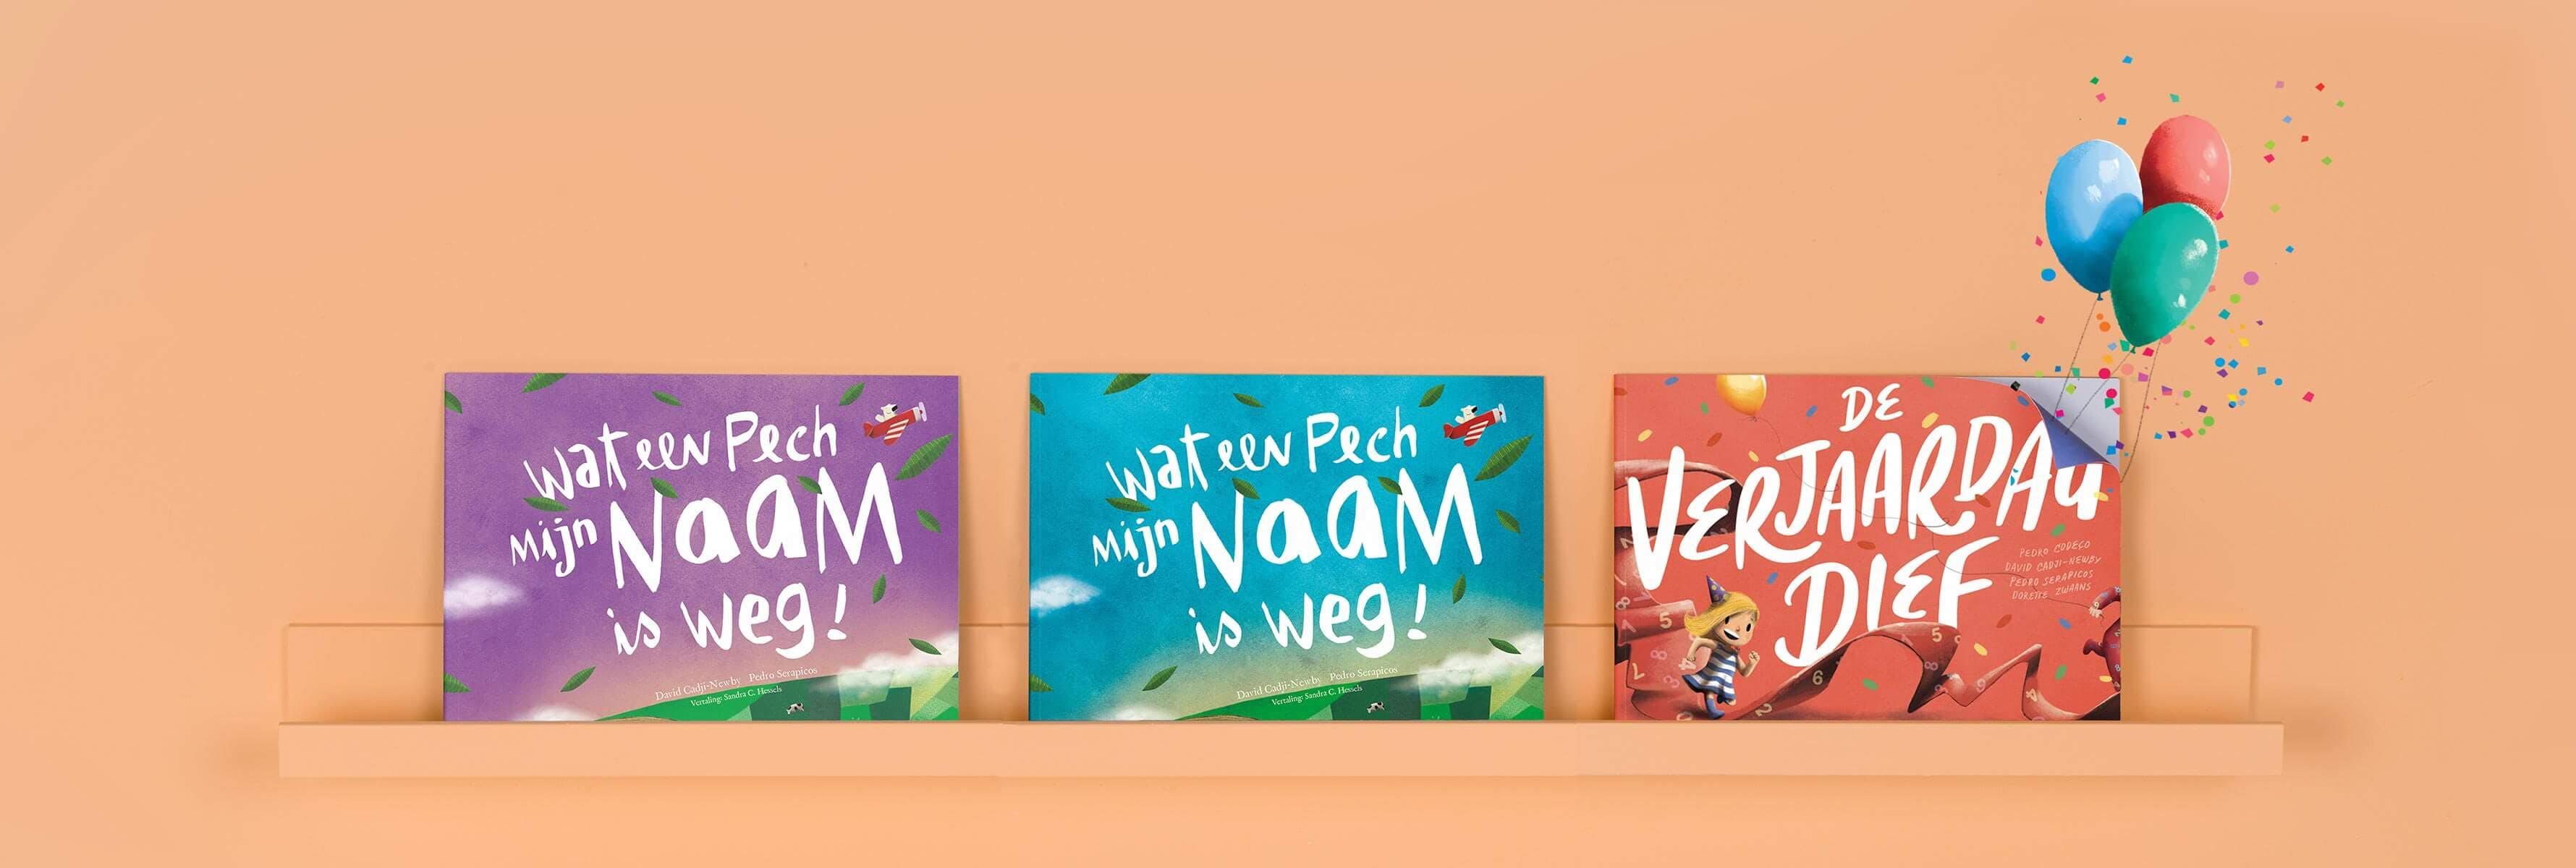 Homepage NL